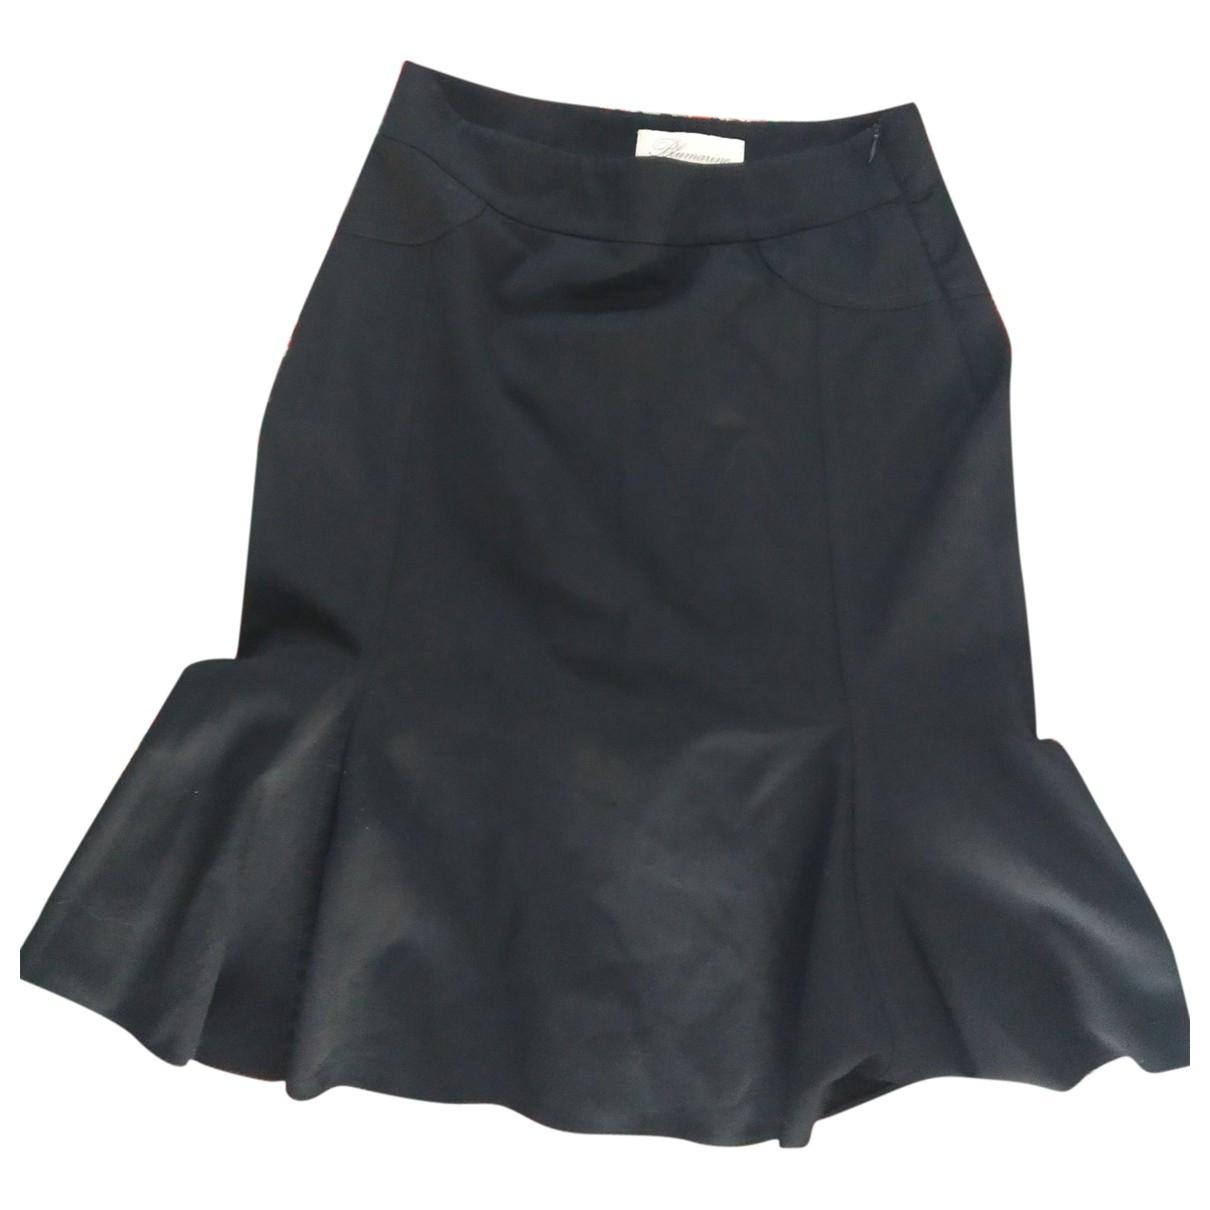 Blumarine \N Black Wool skirt for Women 42 IT